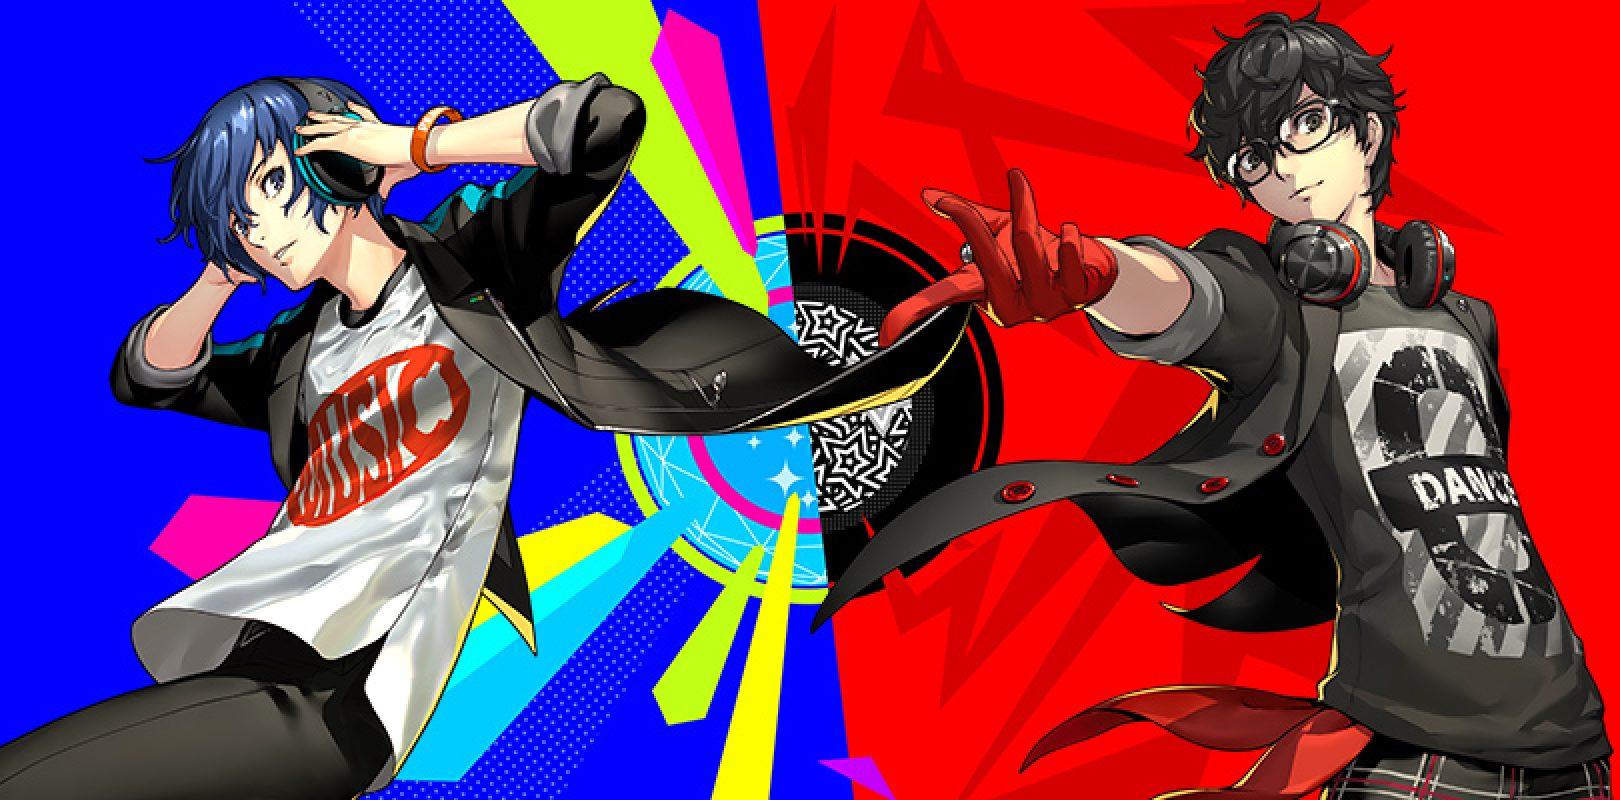 Persona 3: Dancing in Moonlight / Persona 5: Dancing in Starlight